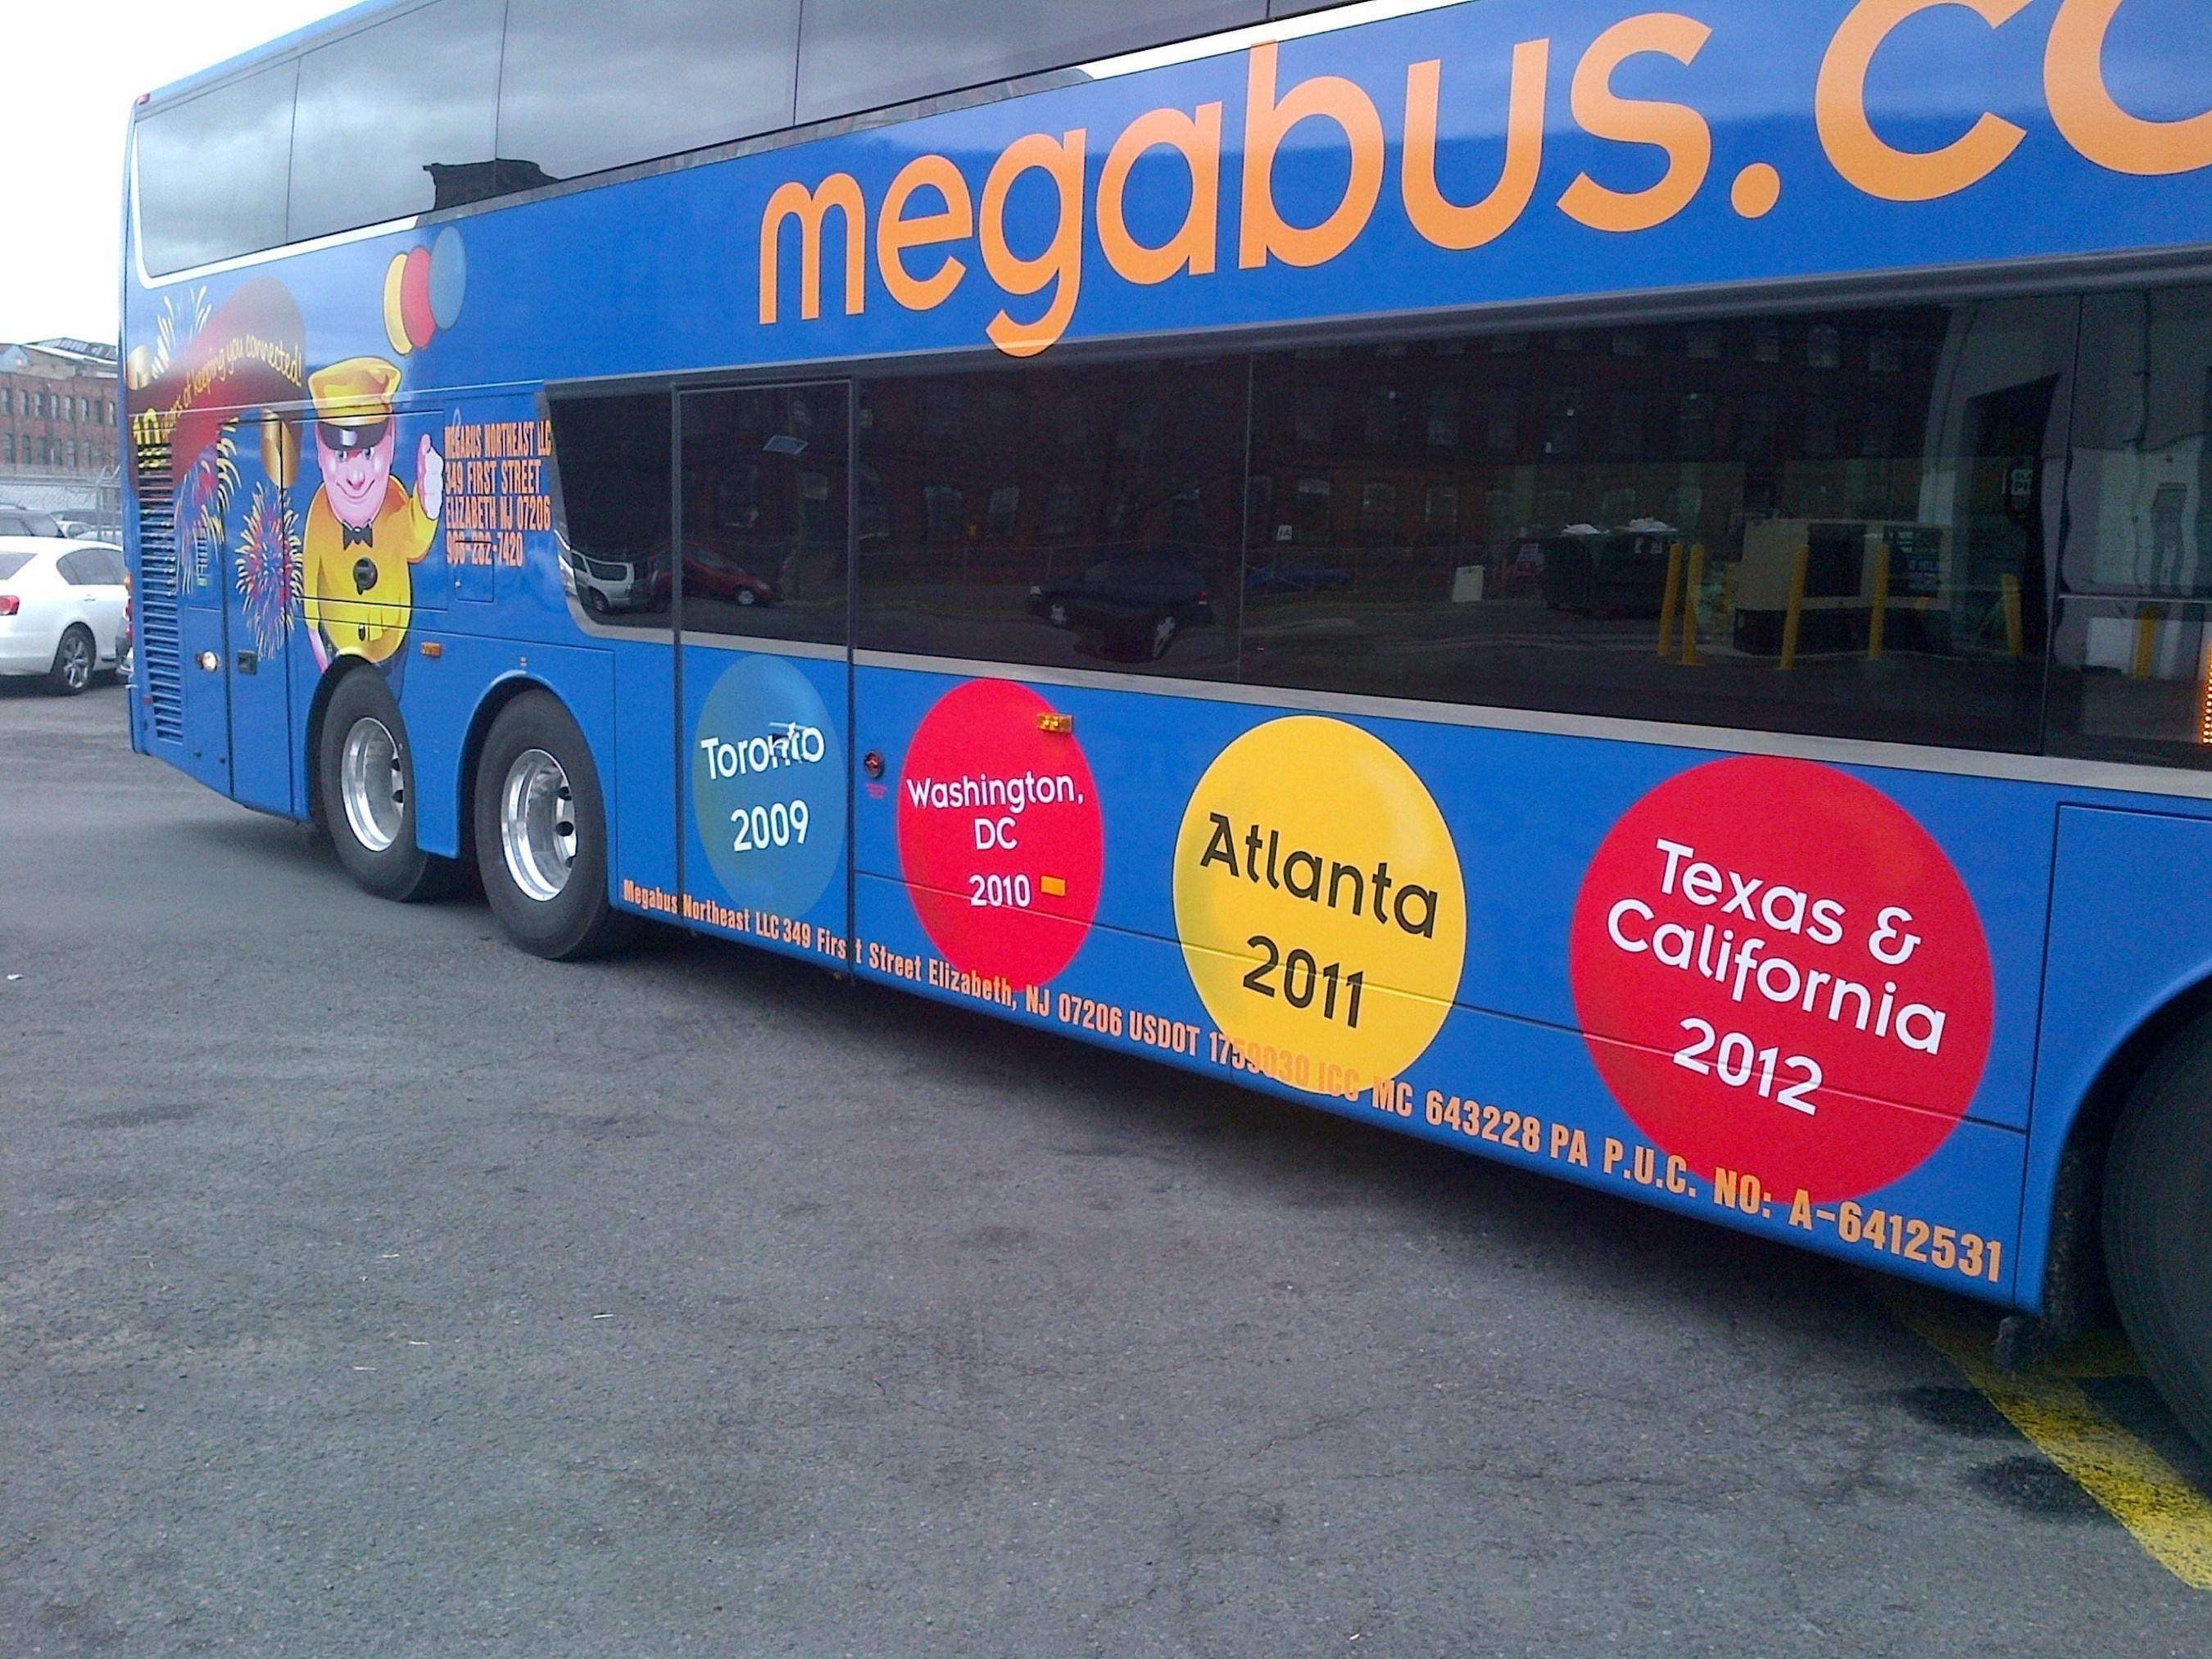 megabus.com Celebrates 10 Years of Ecofriendly Travel in the U.S.